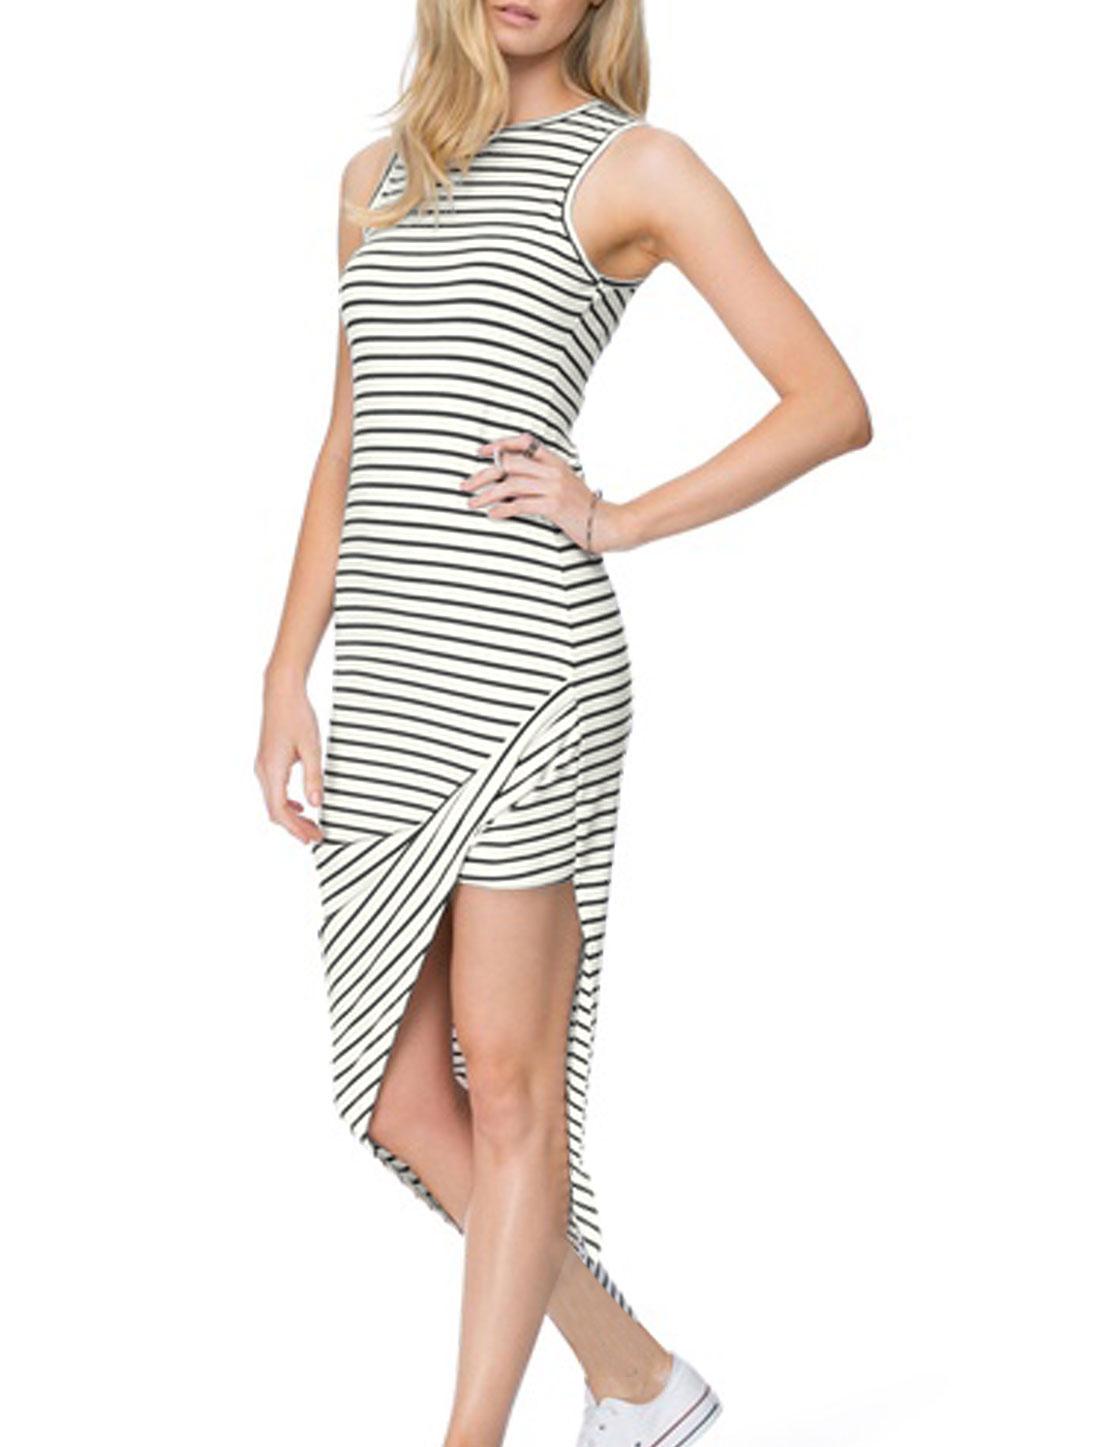 Ladies Round Neck Asymmetric Hem Casual Dress Black Off White S